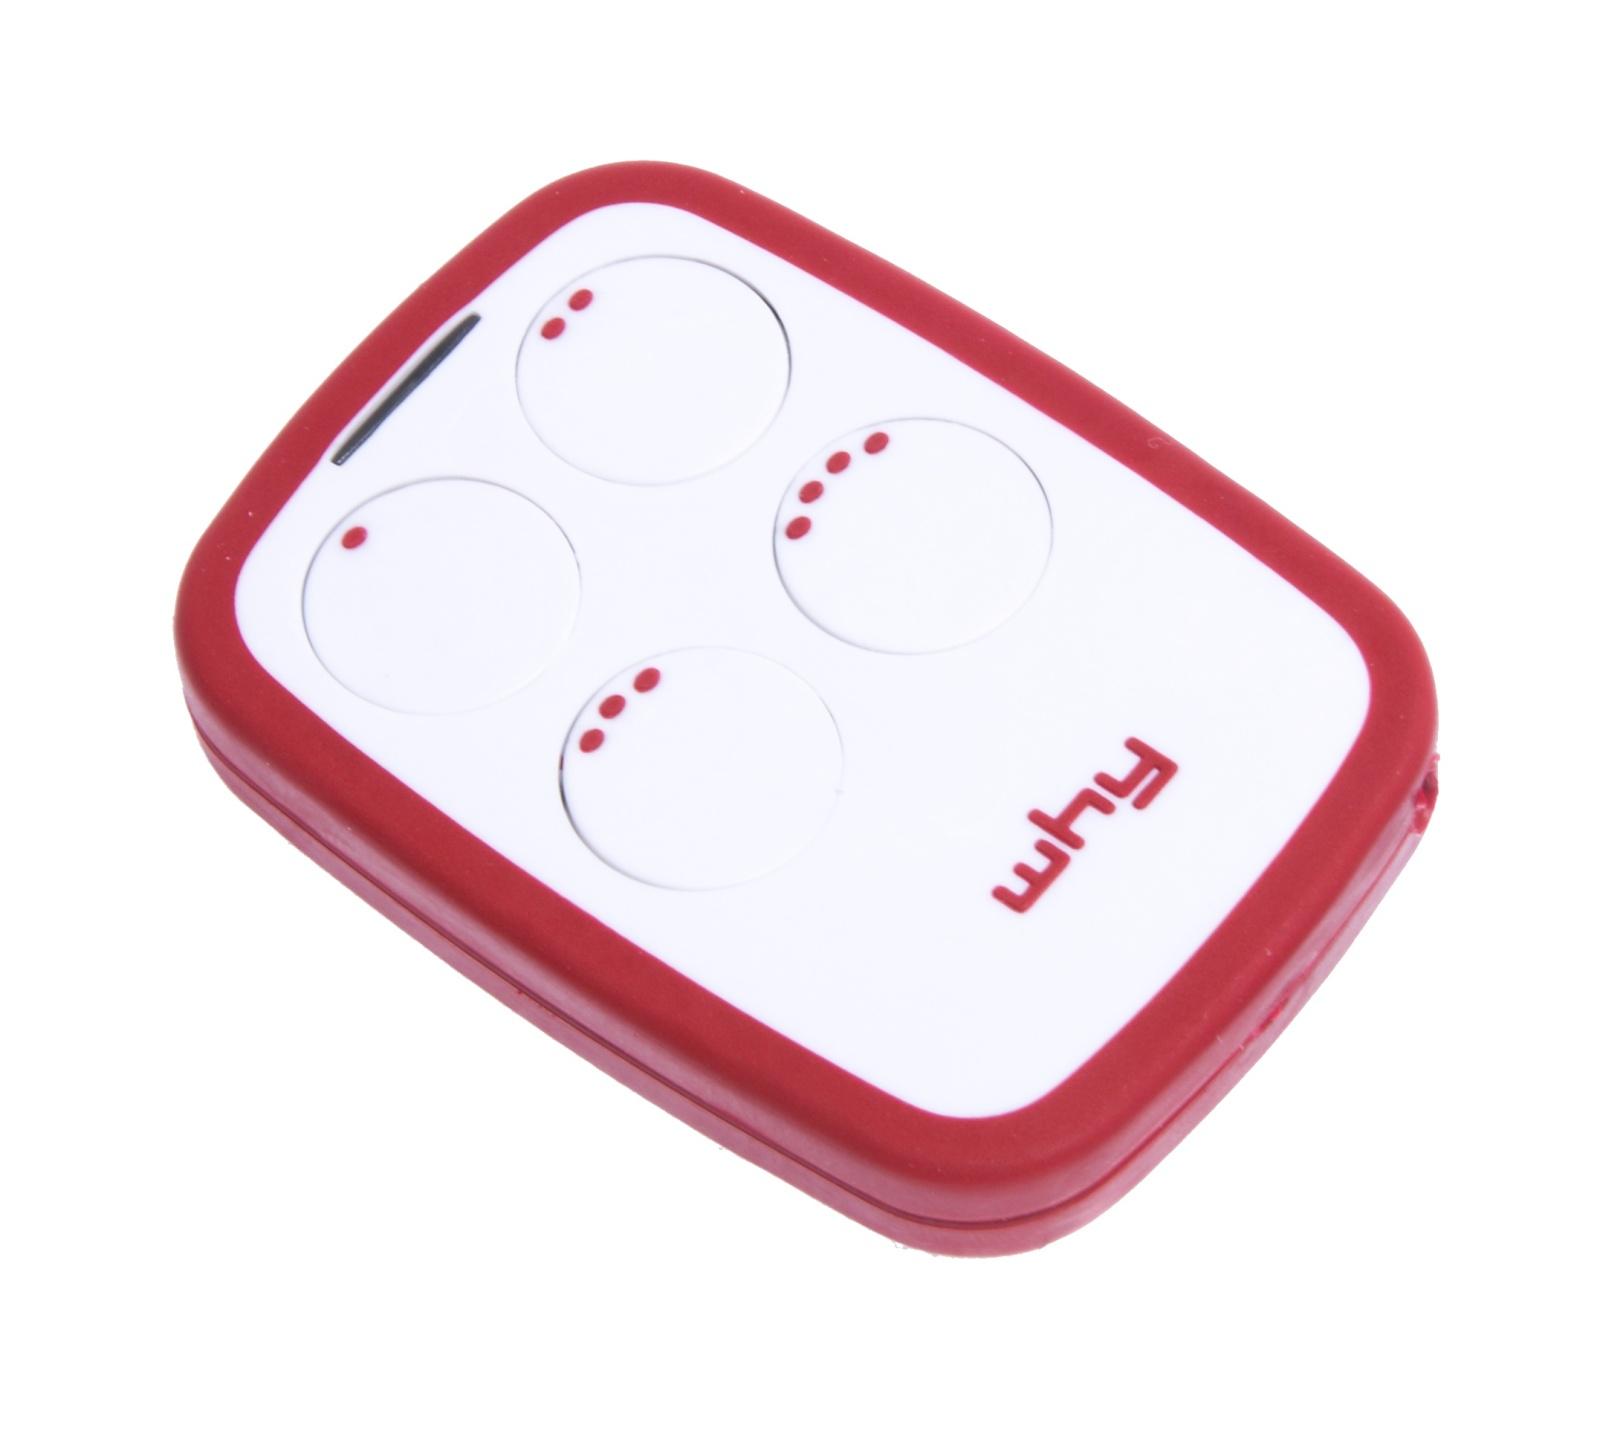 SiceTech univerzální ovladač WHY EVO 6.3, barva bílá / červená